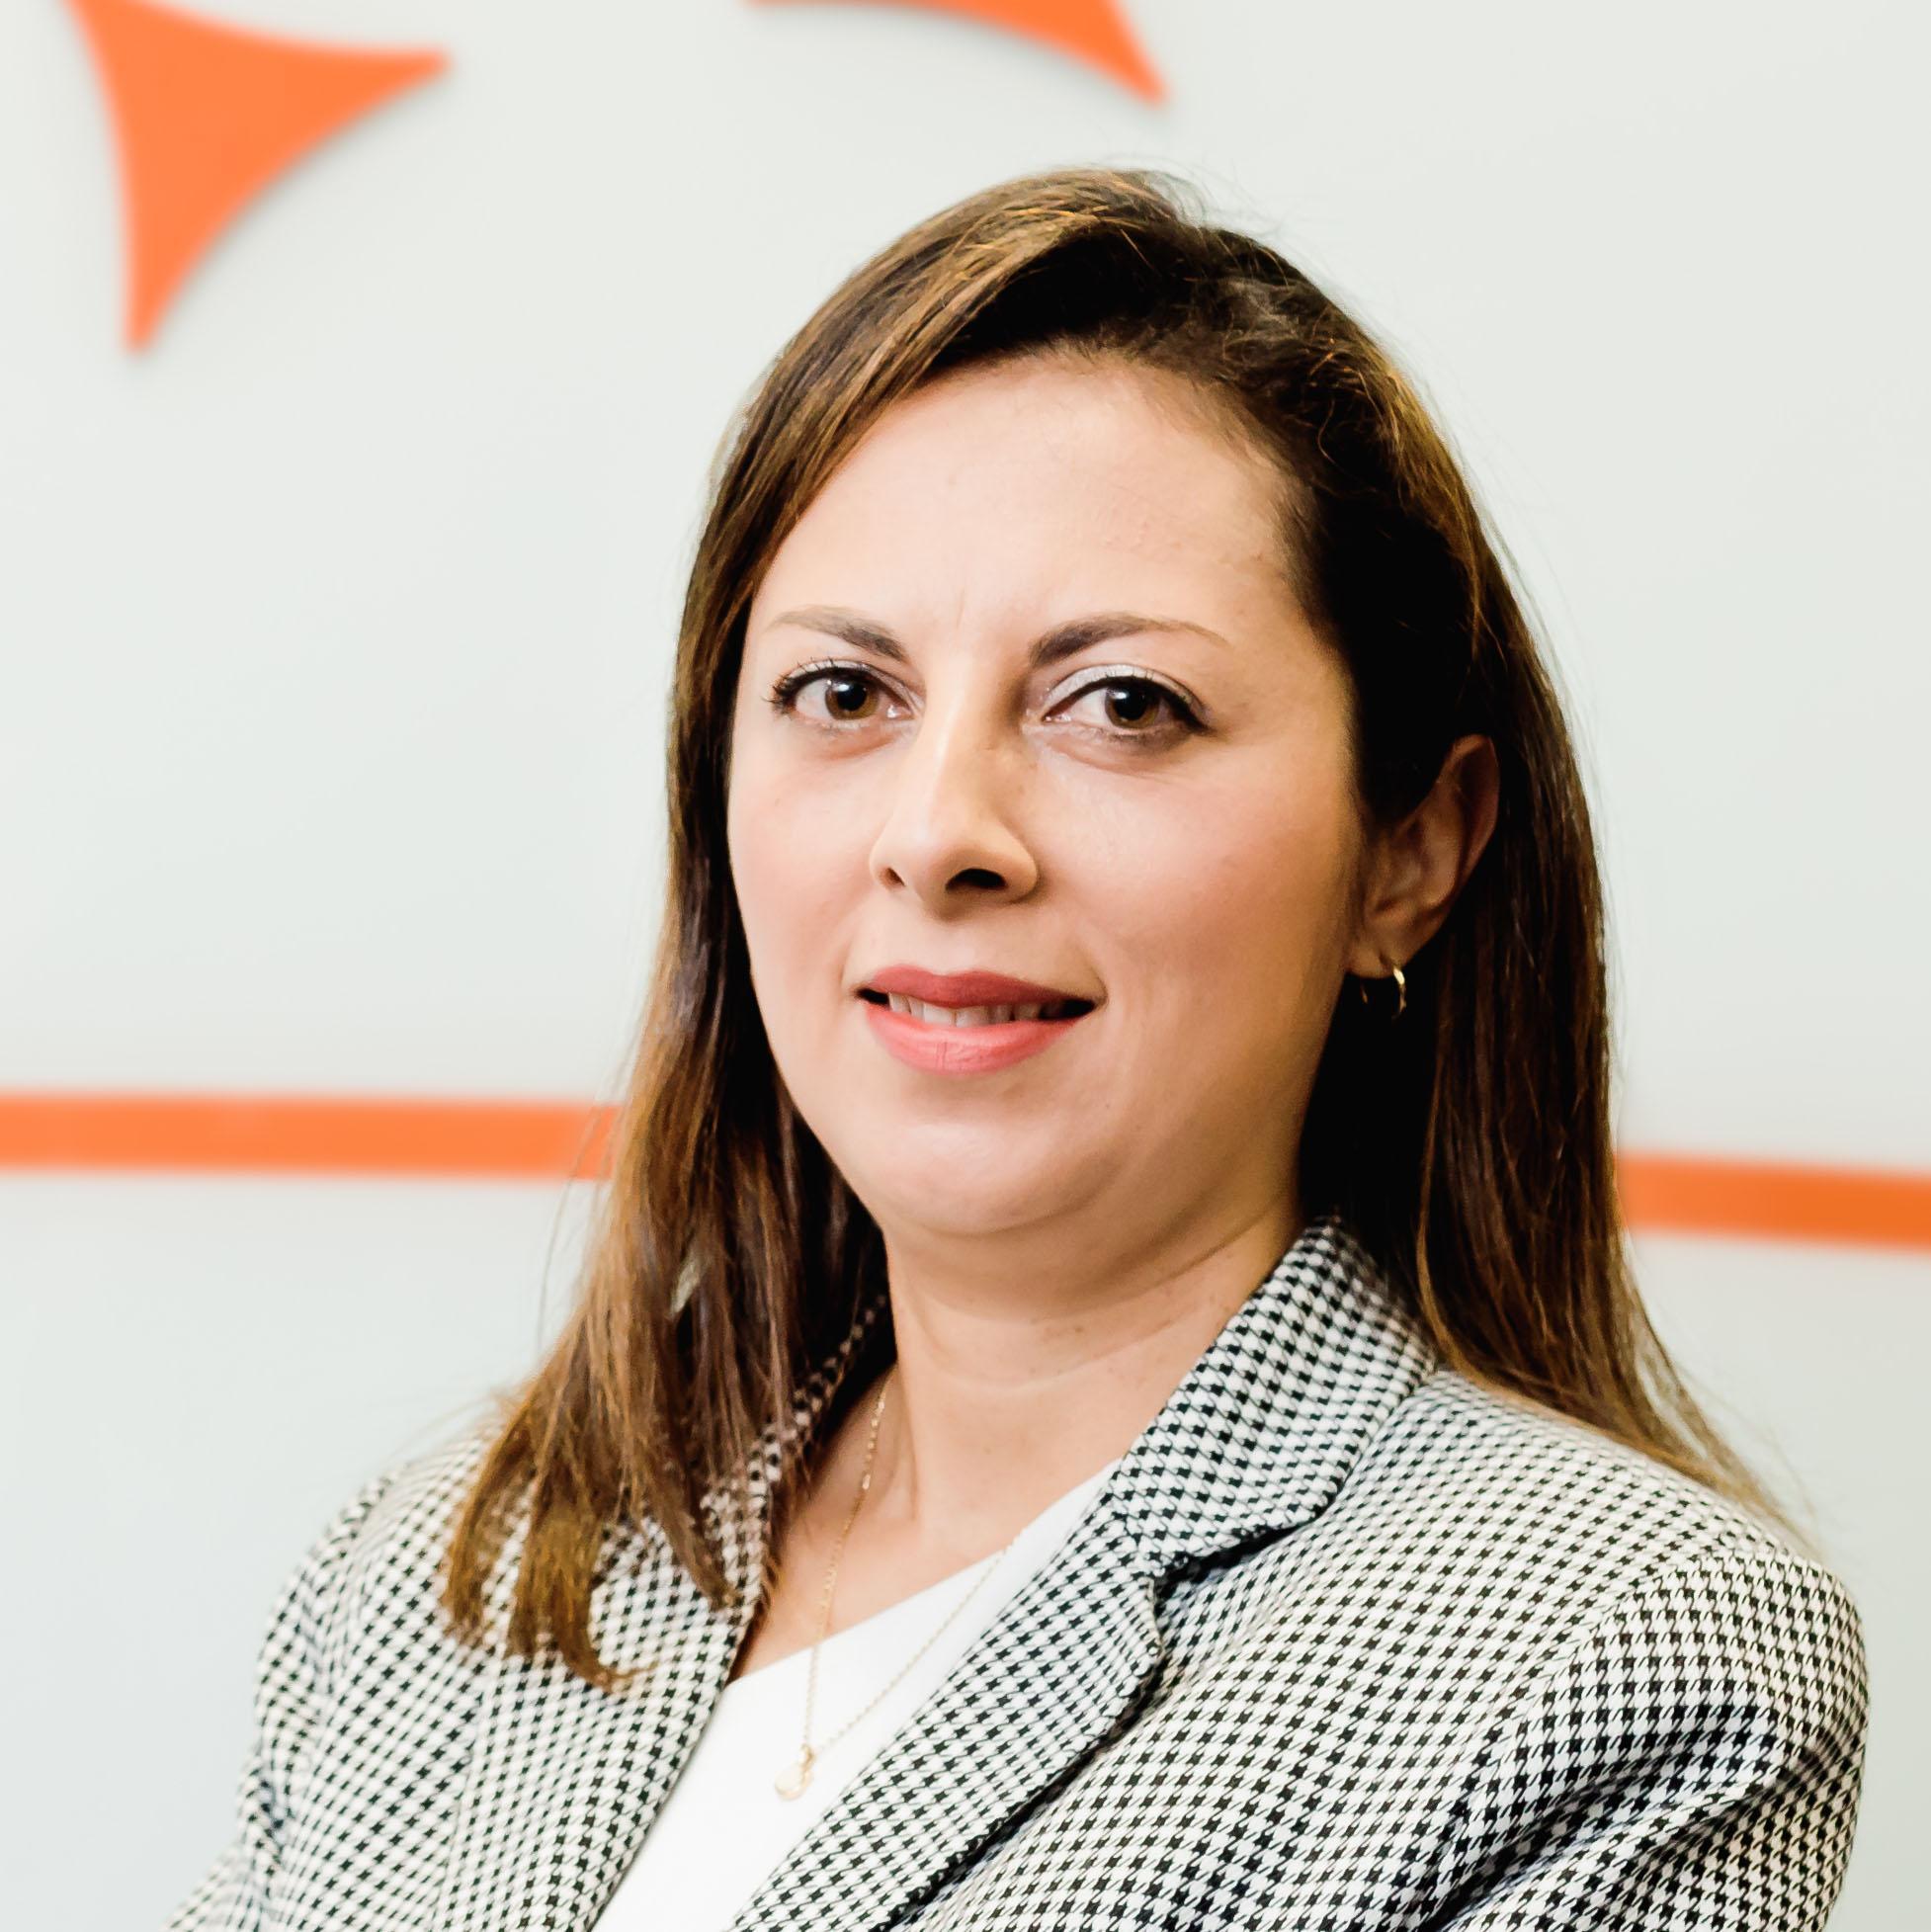 Yanira Montejo Buitrago